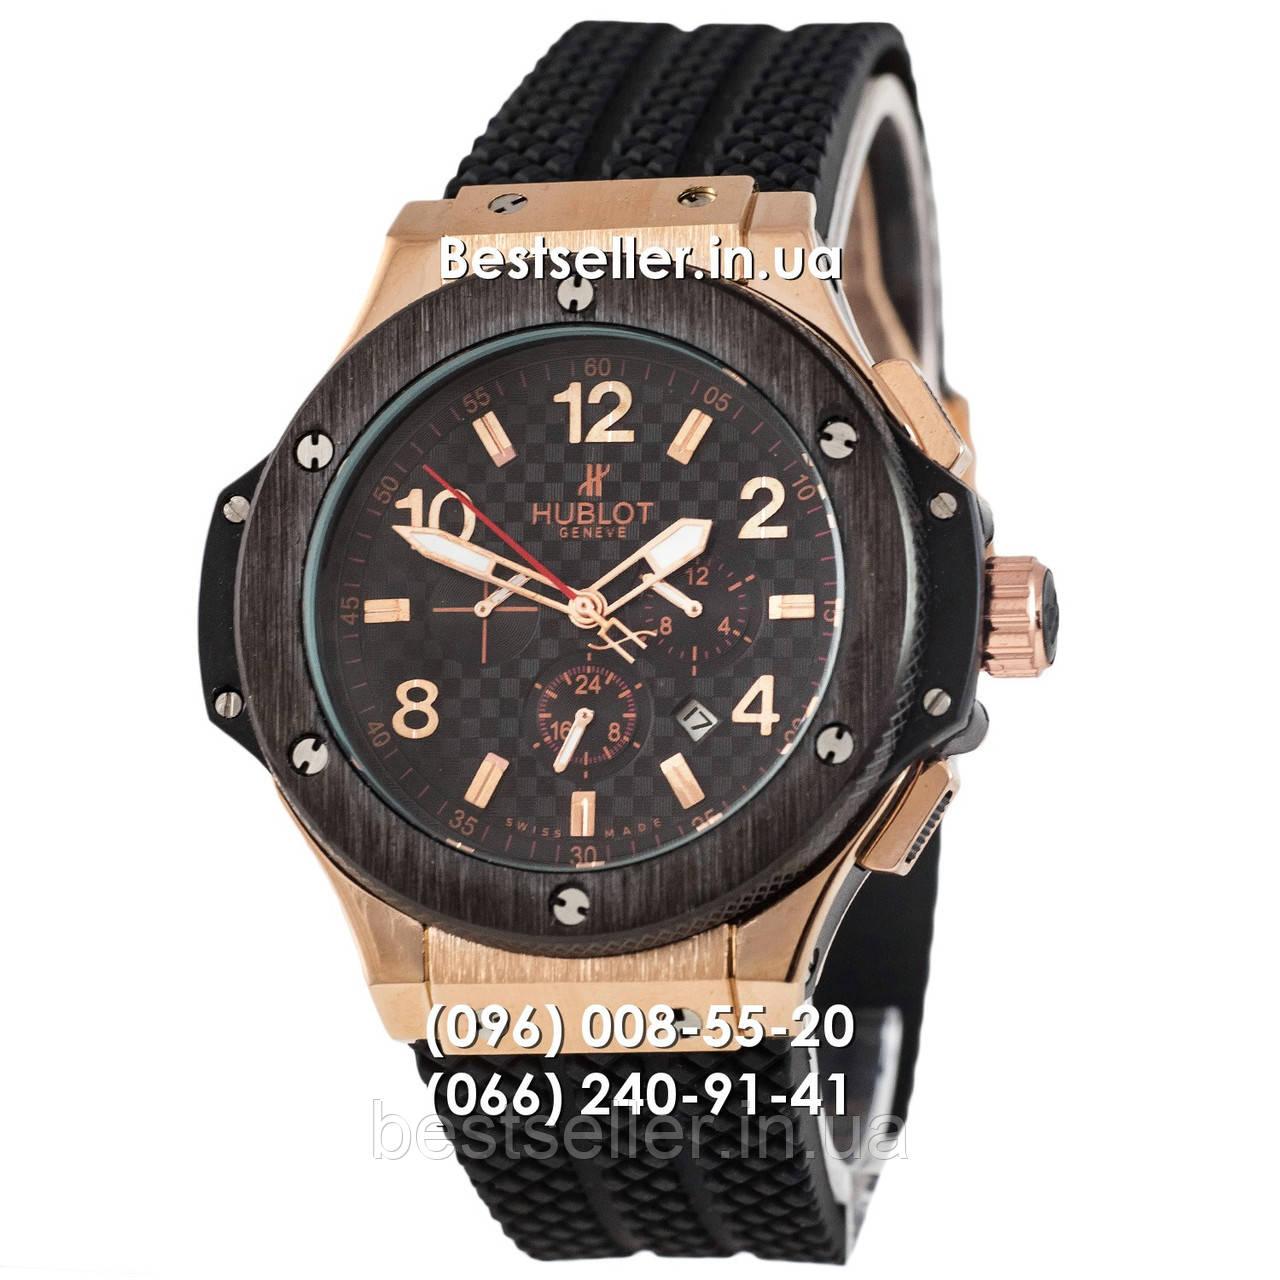 Часы Hublot Big Bang Rose Gold Glass 18k (Механика). - Интернет-магазин 5bb5203f26eb2